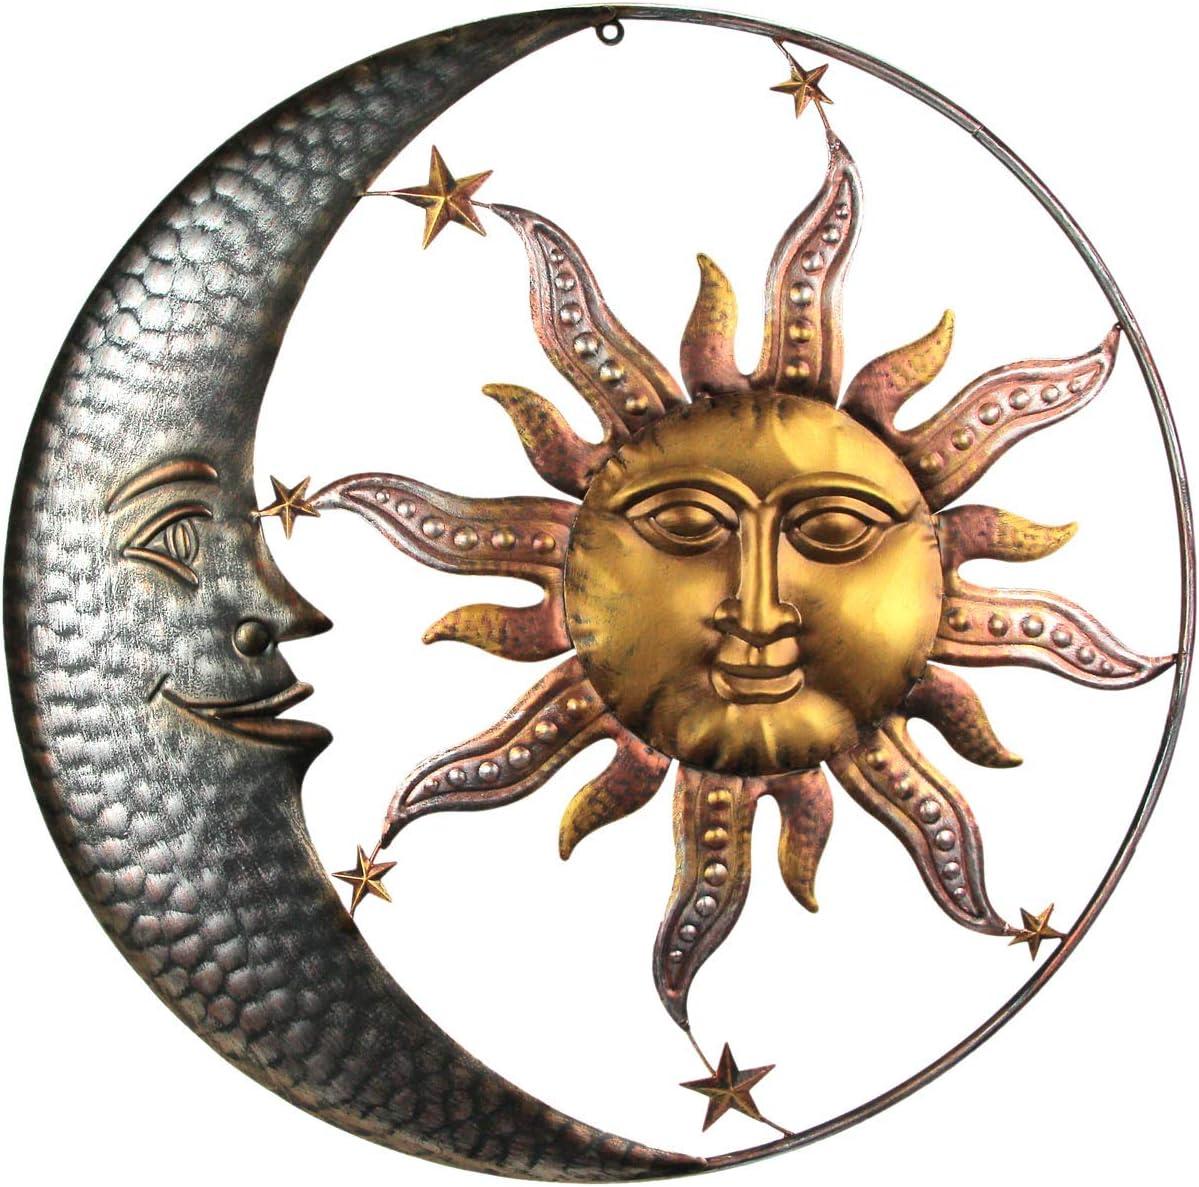 Direct International 28 Inch Diameter Three Tone Metal Art Celestial Sun and Moon Indoor Outdoor Wall Hanging